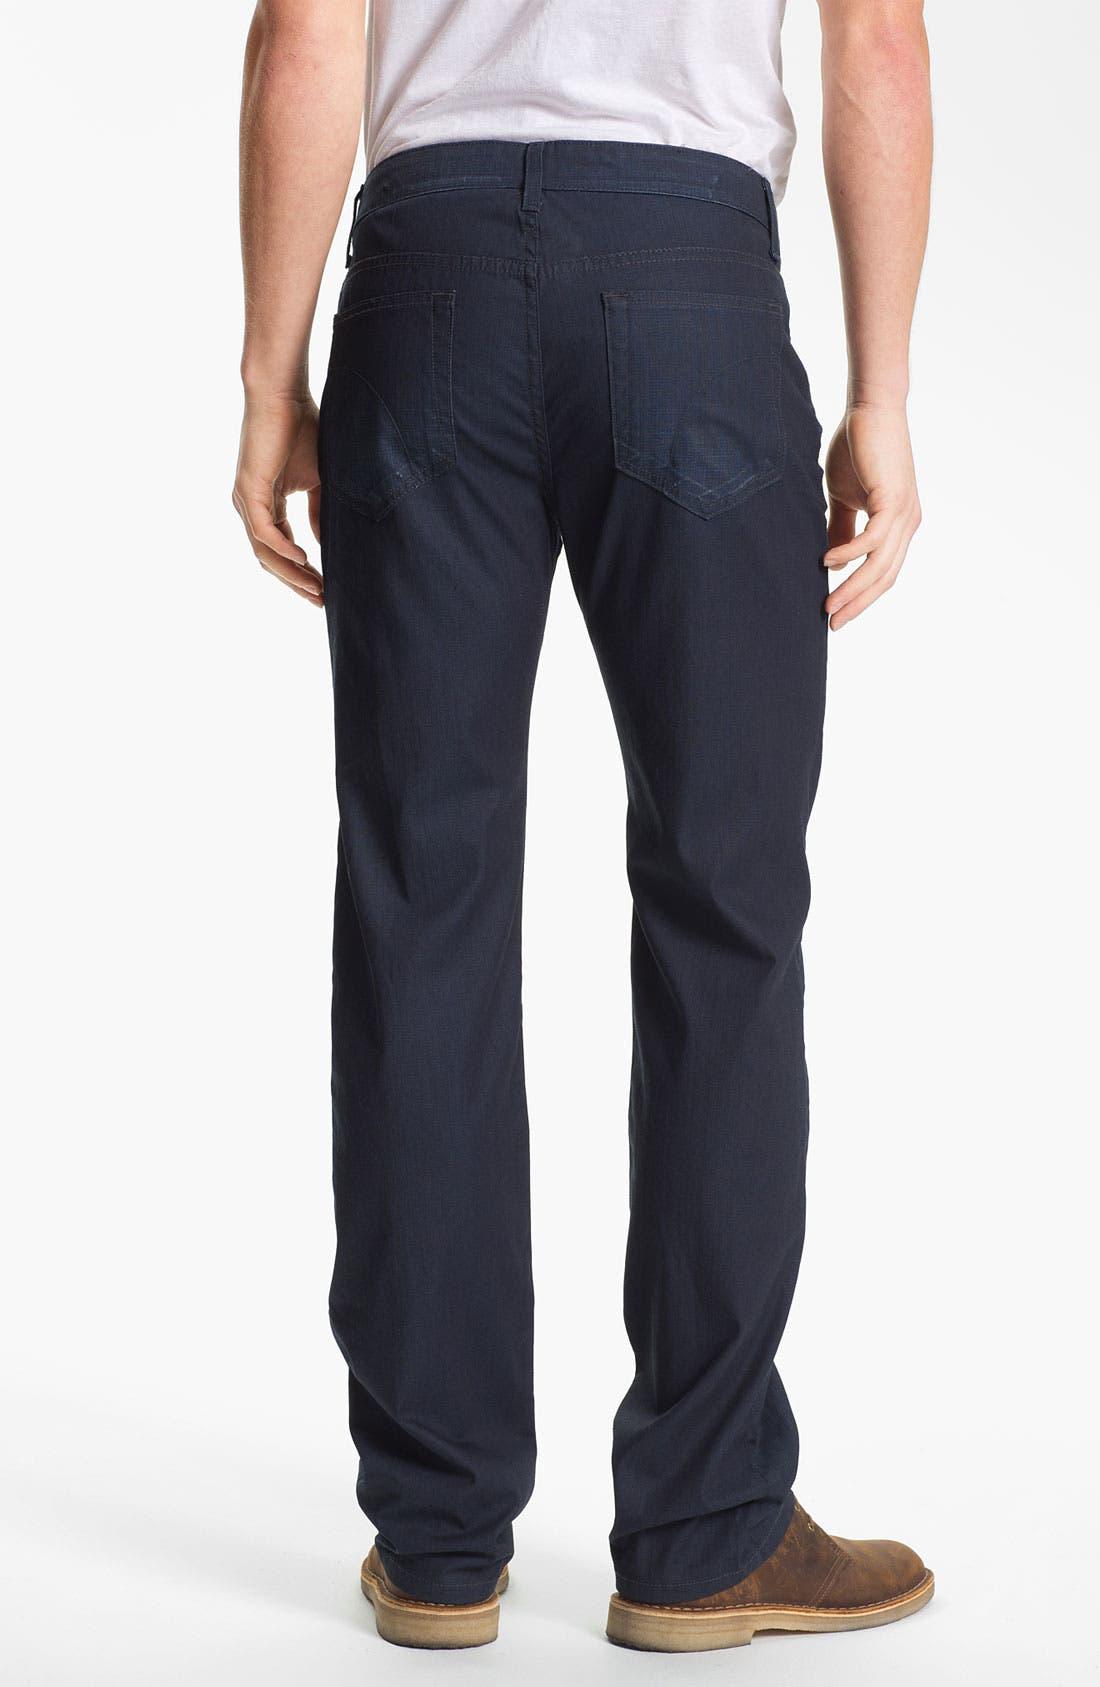 Alternate Image 1 Selected - Joe's 'Classic' Straight Leg Jeans (Patterson)